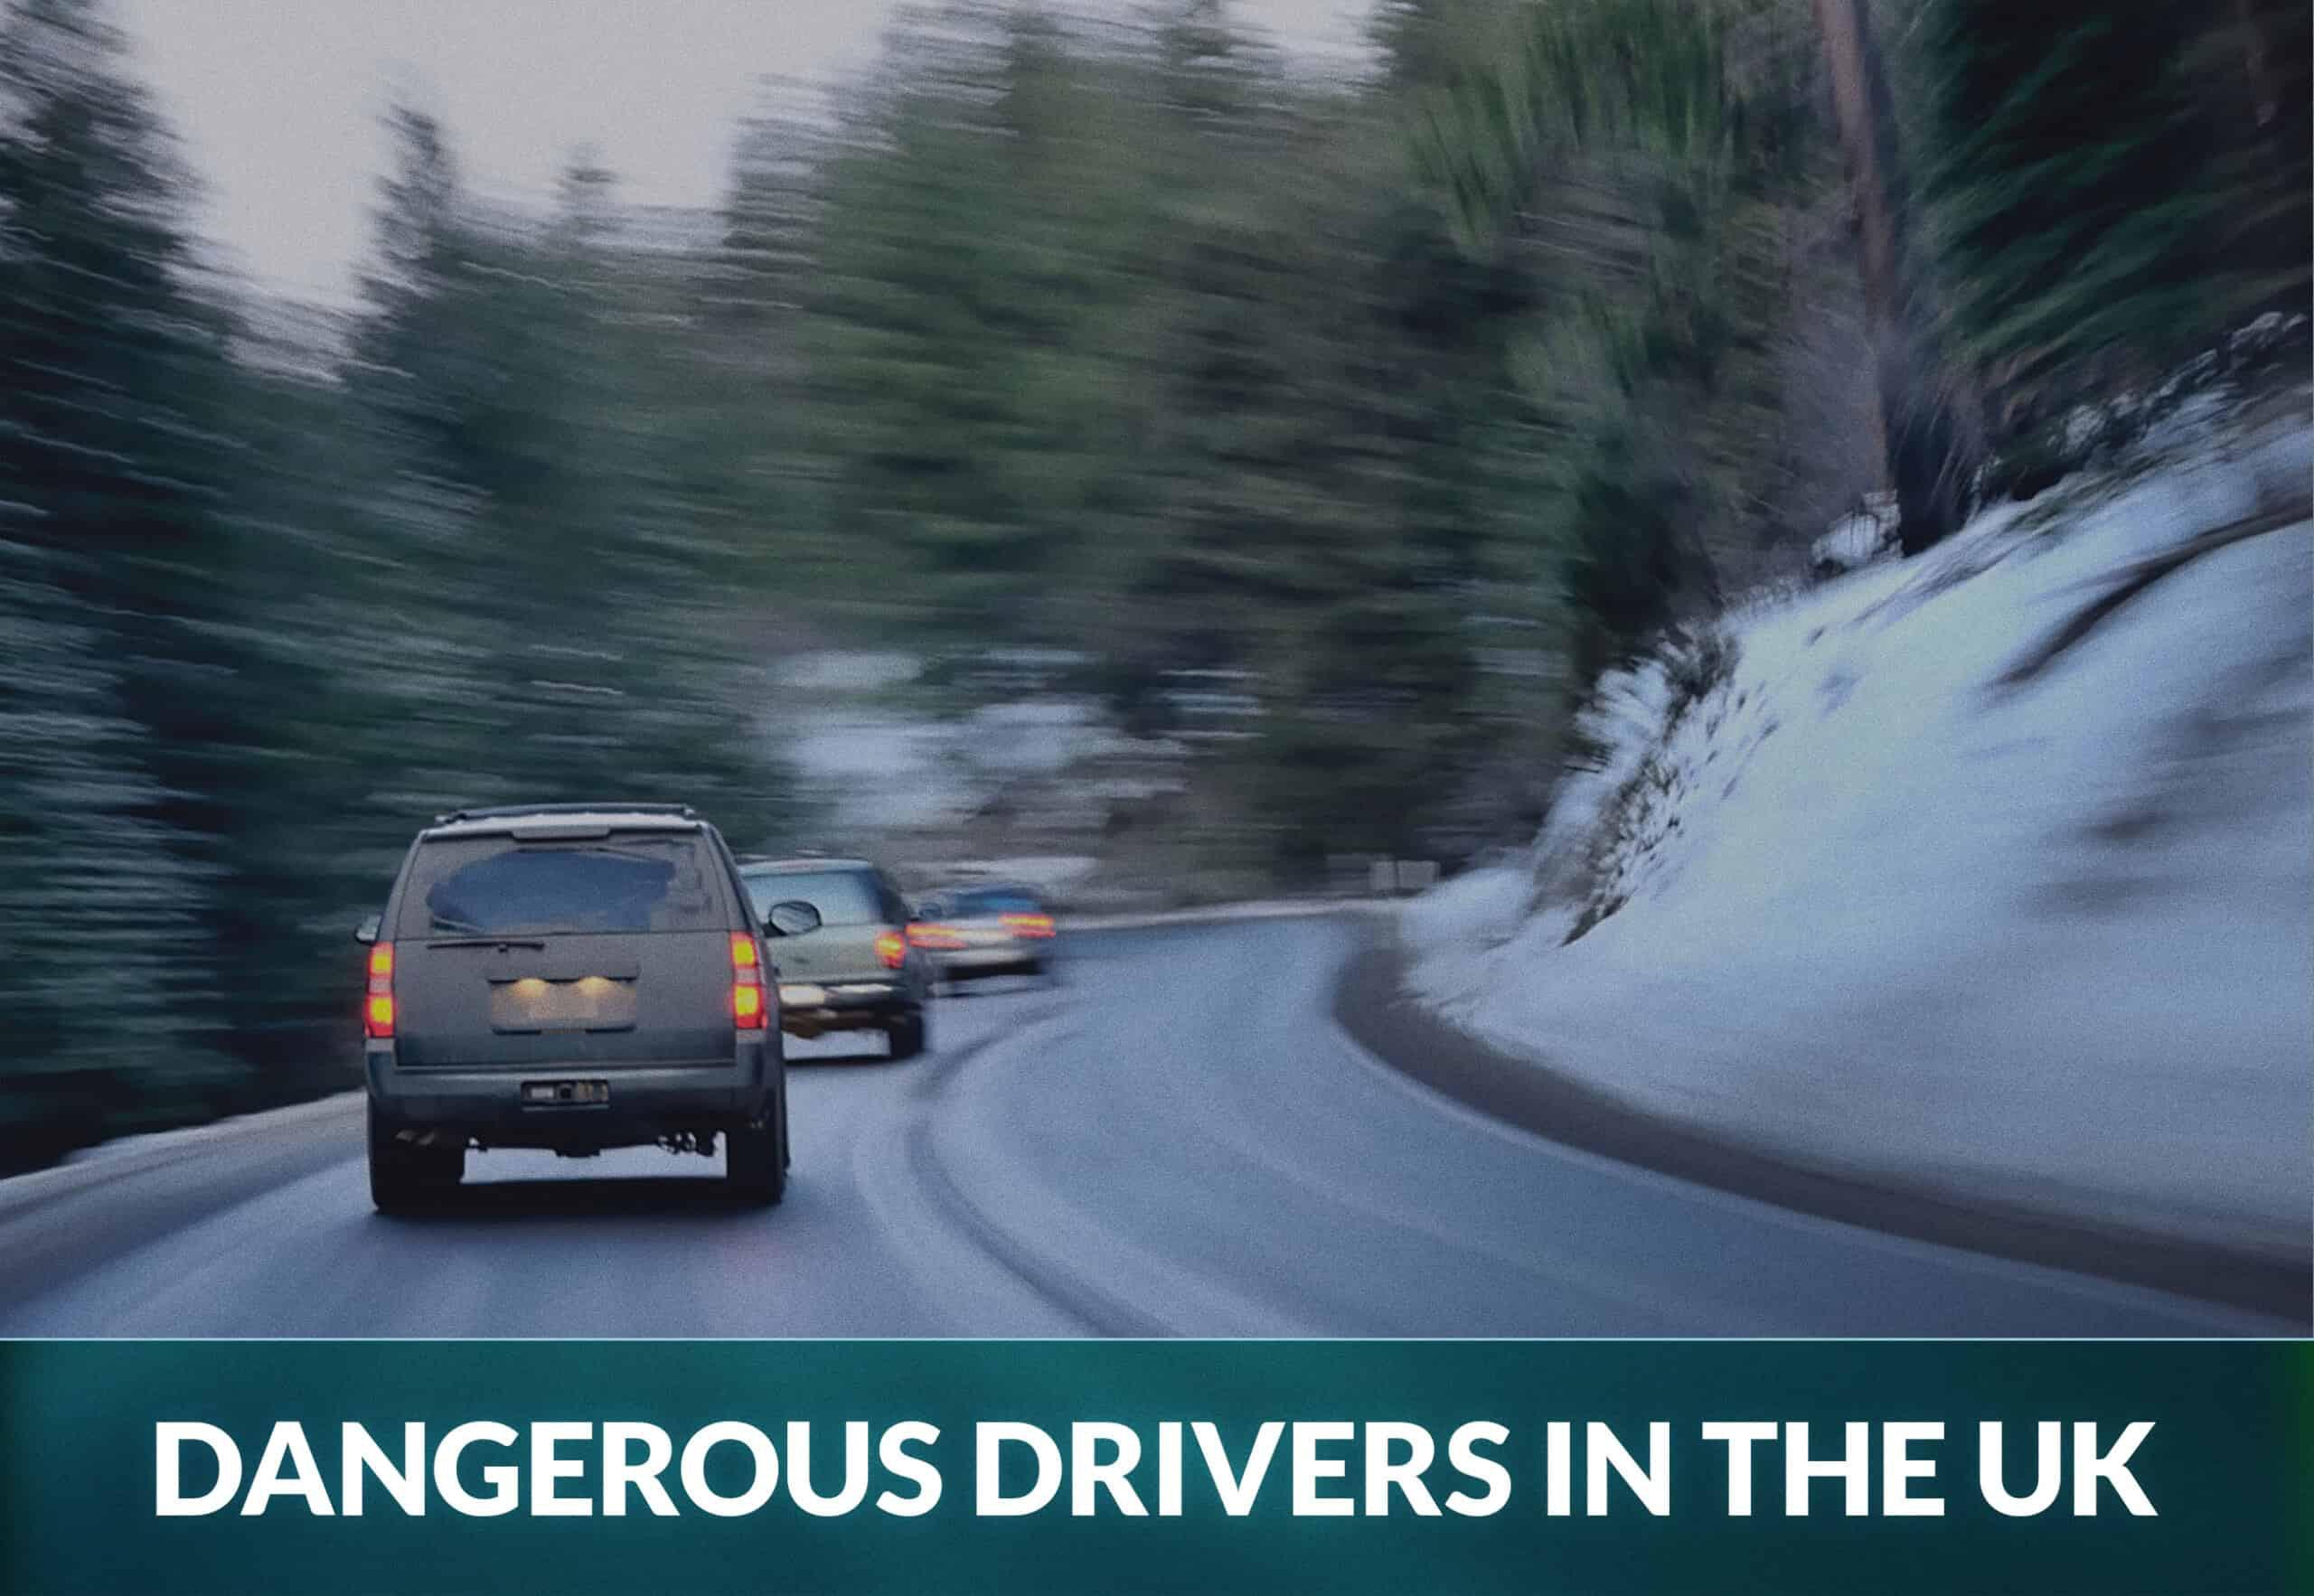 Dangerous drivers in the UK